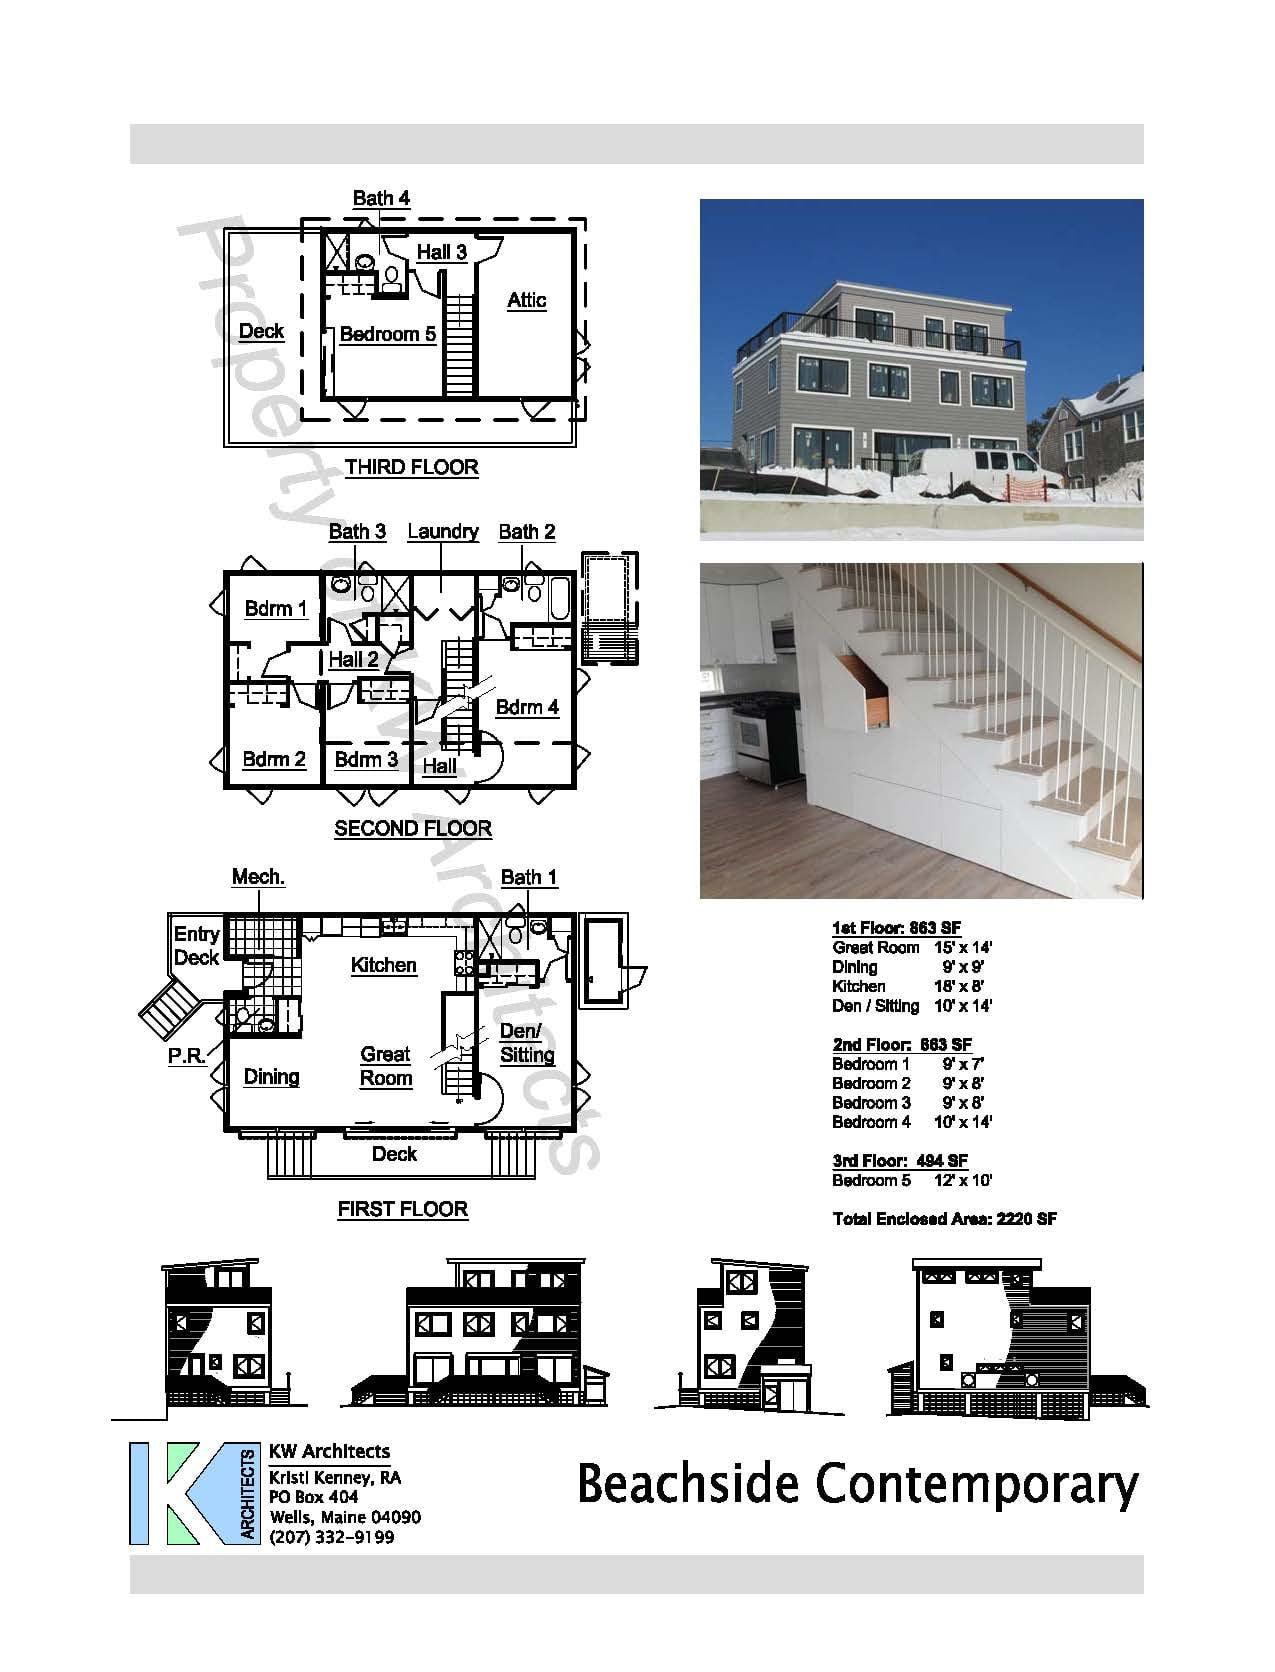 Drakes Island Road Marketing Sheet.jpg